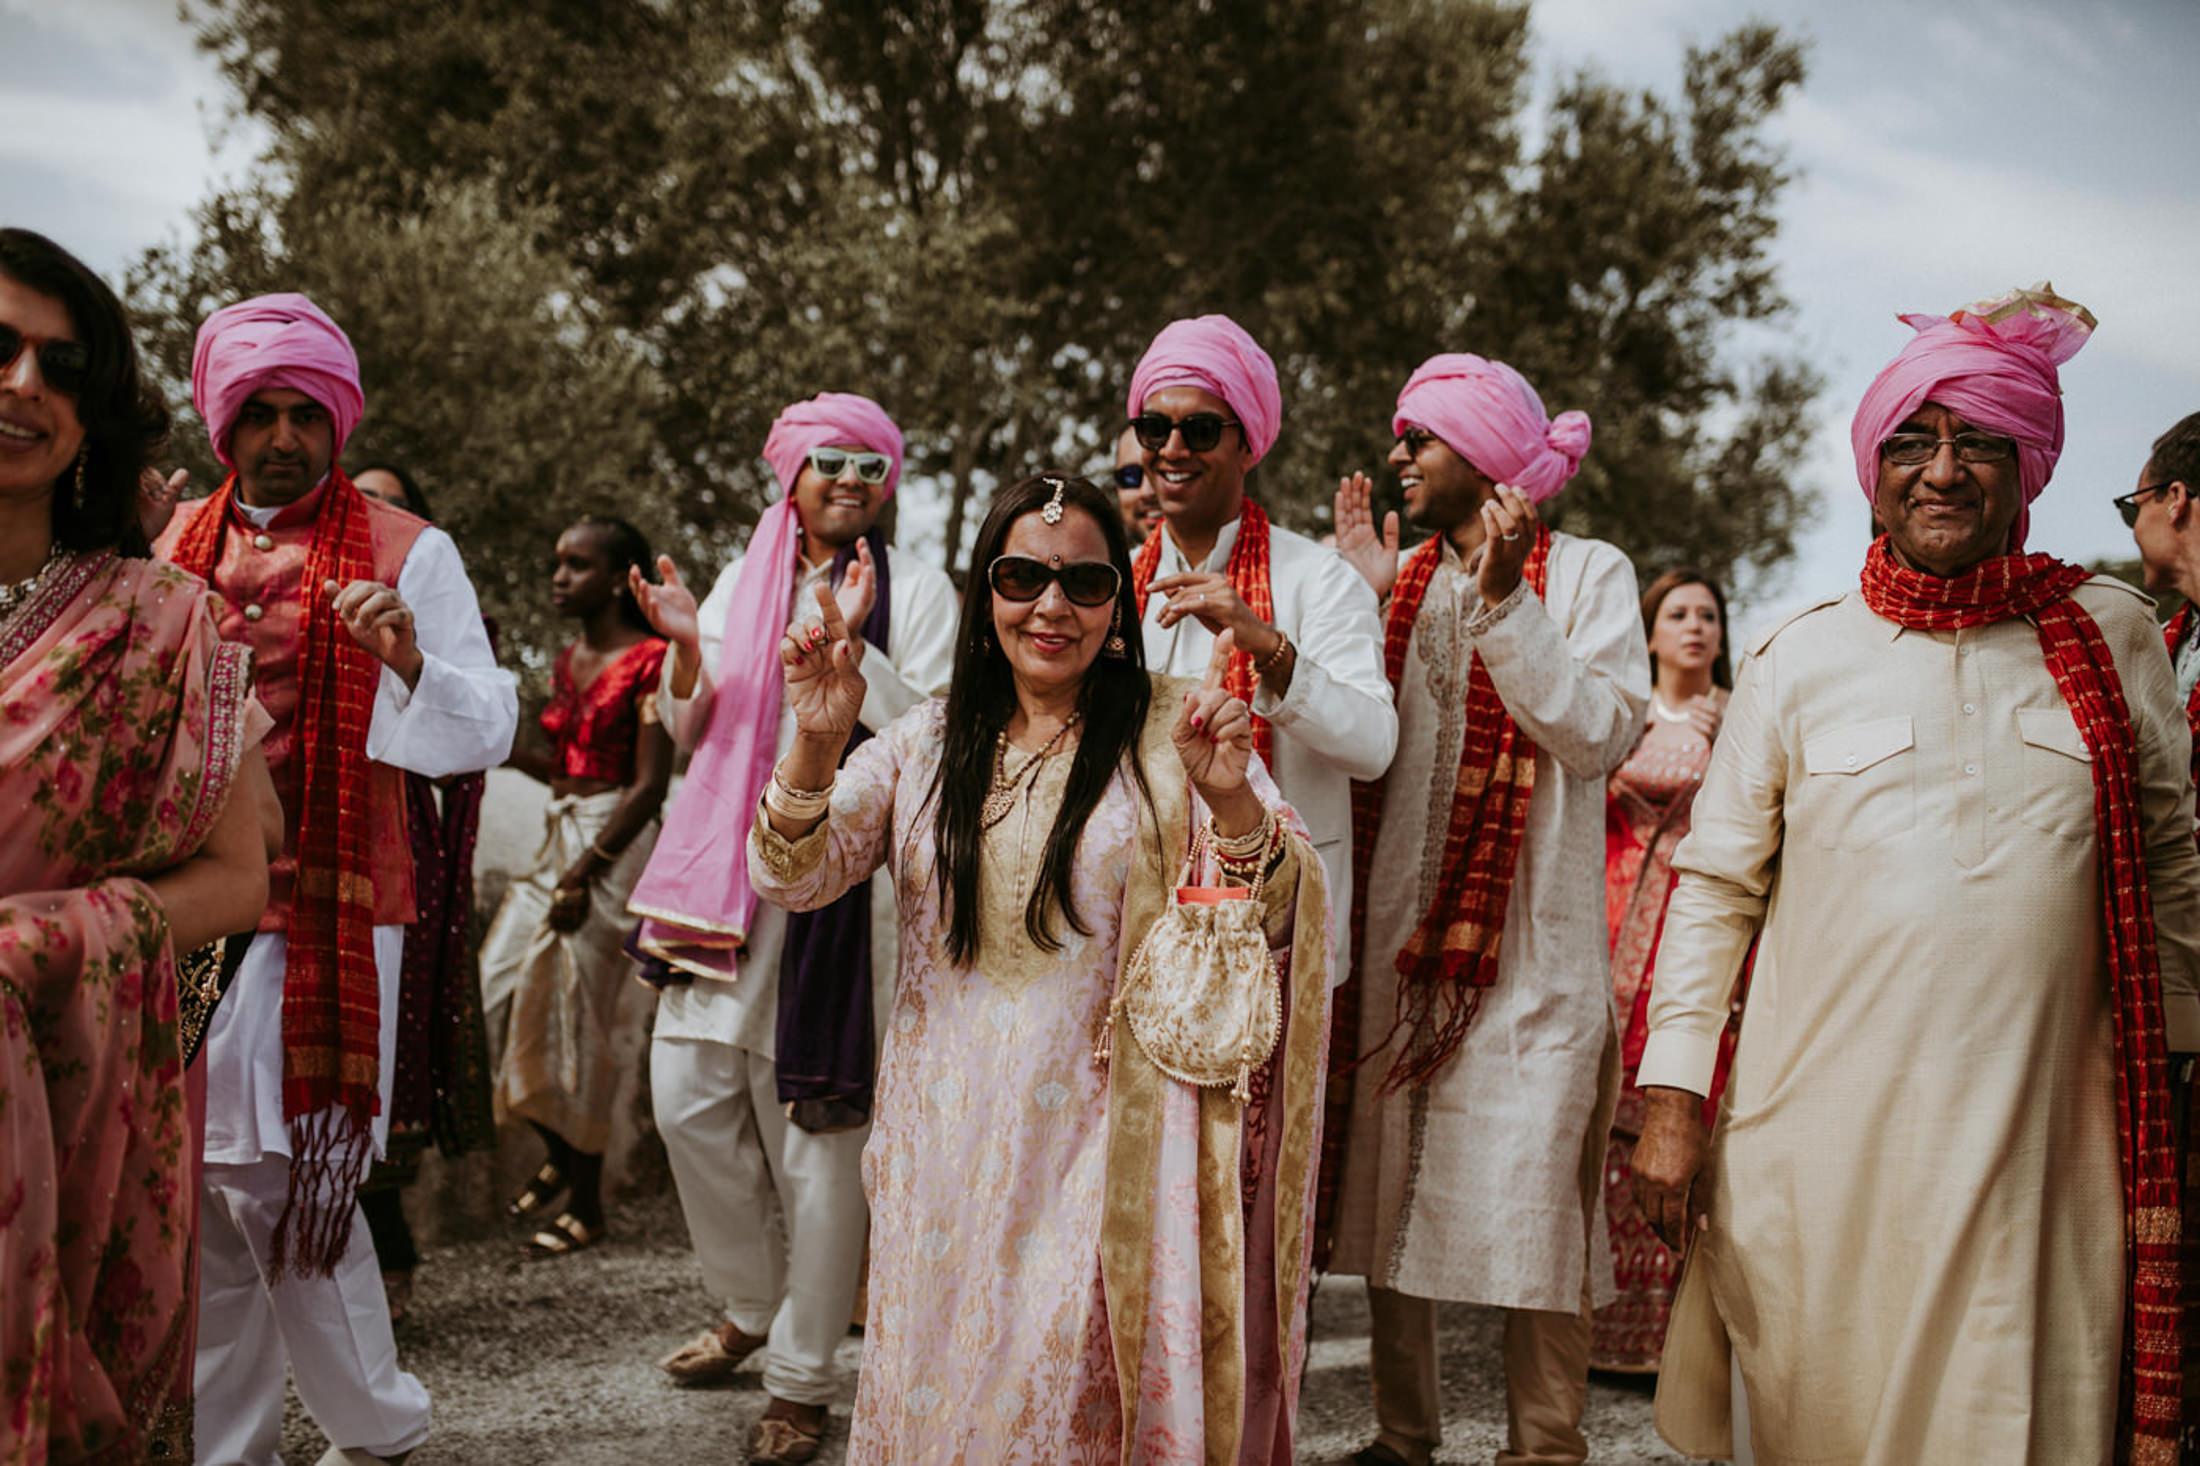 Wedding_Photographer_Mallorca_Daniela-Marquardt_Photography_New_York_Iceland_Tuscany_Santorini_Portugal_Austria_Bavaria_Elopement_Hochzeitsfotograf_AntjeRajat2_32